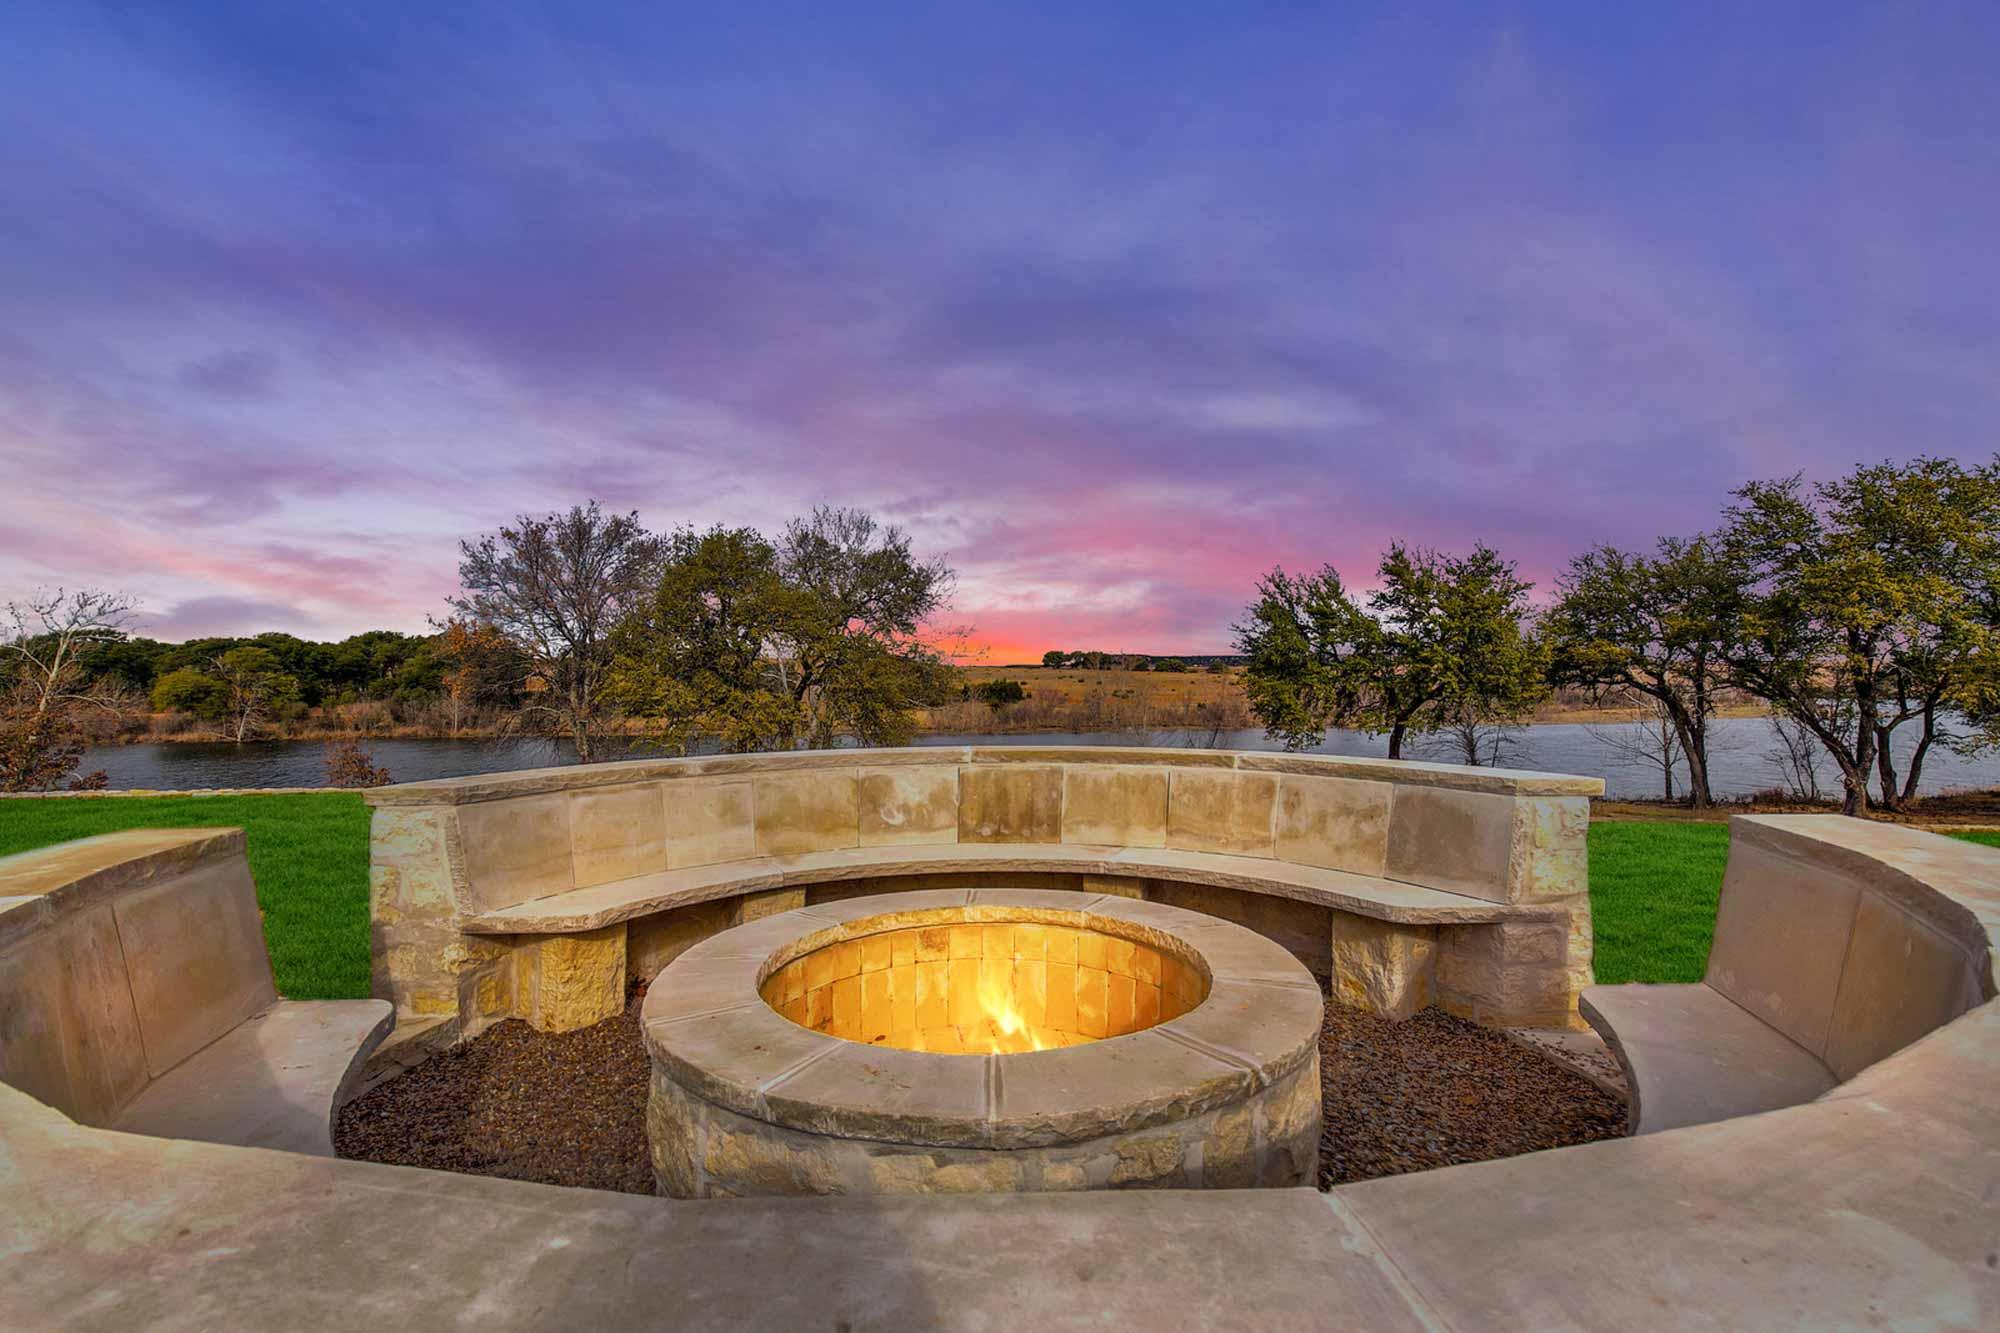 Steve-Bumpas-Custom-Homes-The-Residences-at-Rough-Creek-Lodge-The-Lynn-Lot-15-25-North-Texas-Ranch-Homes-for-Sale.jpg